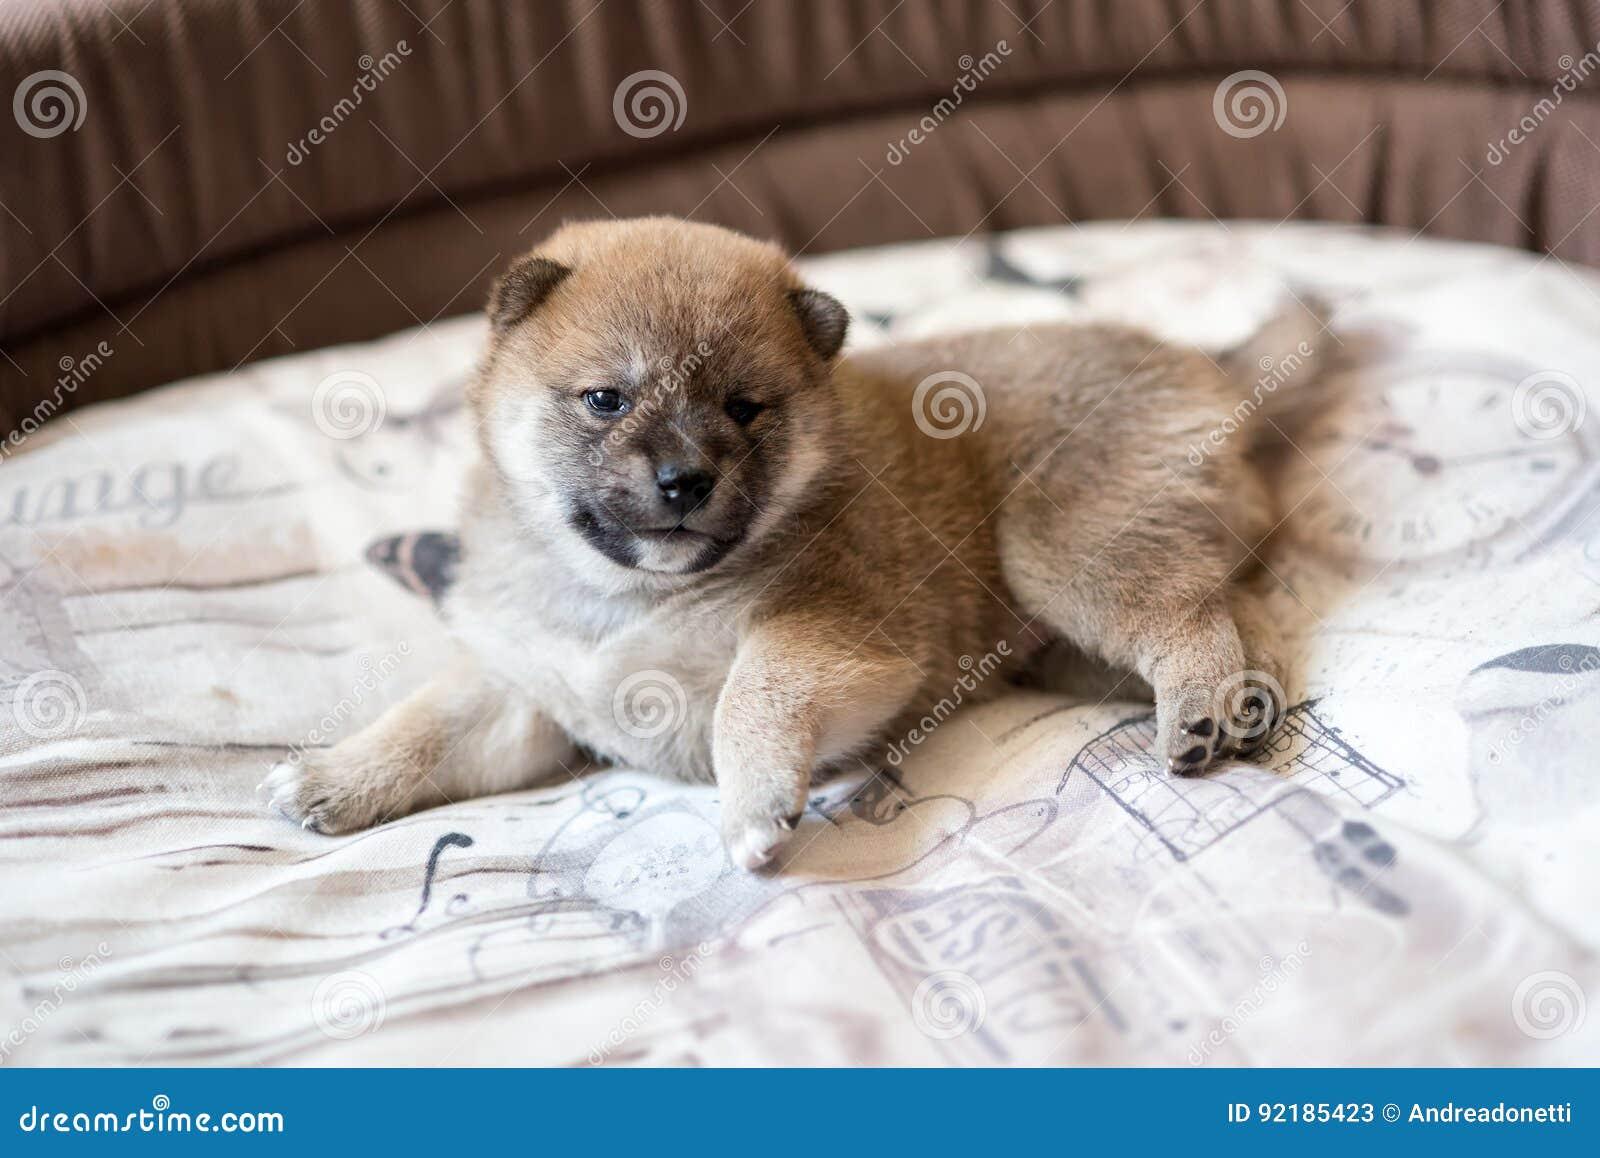 Cute Shiba Inu puppy dog stock image  Image of cream - 92185423